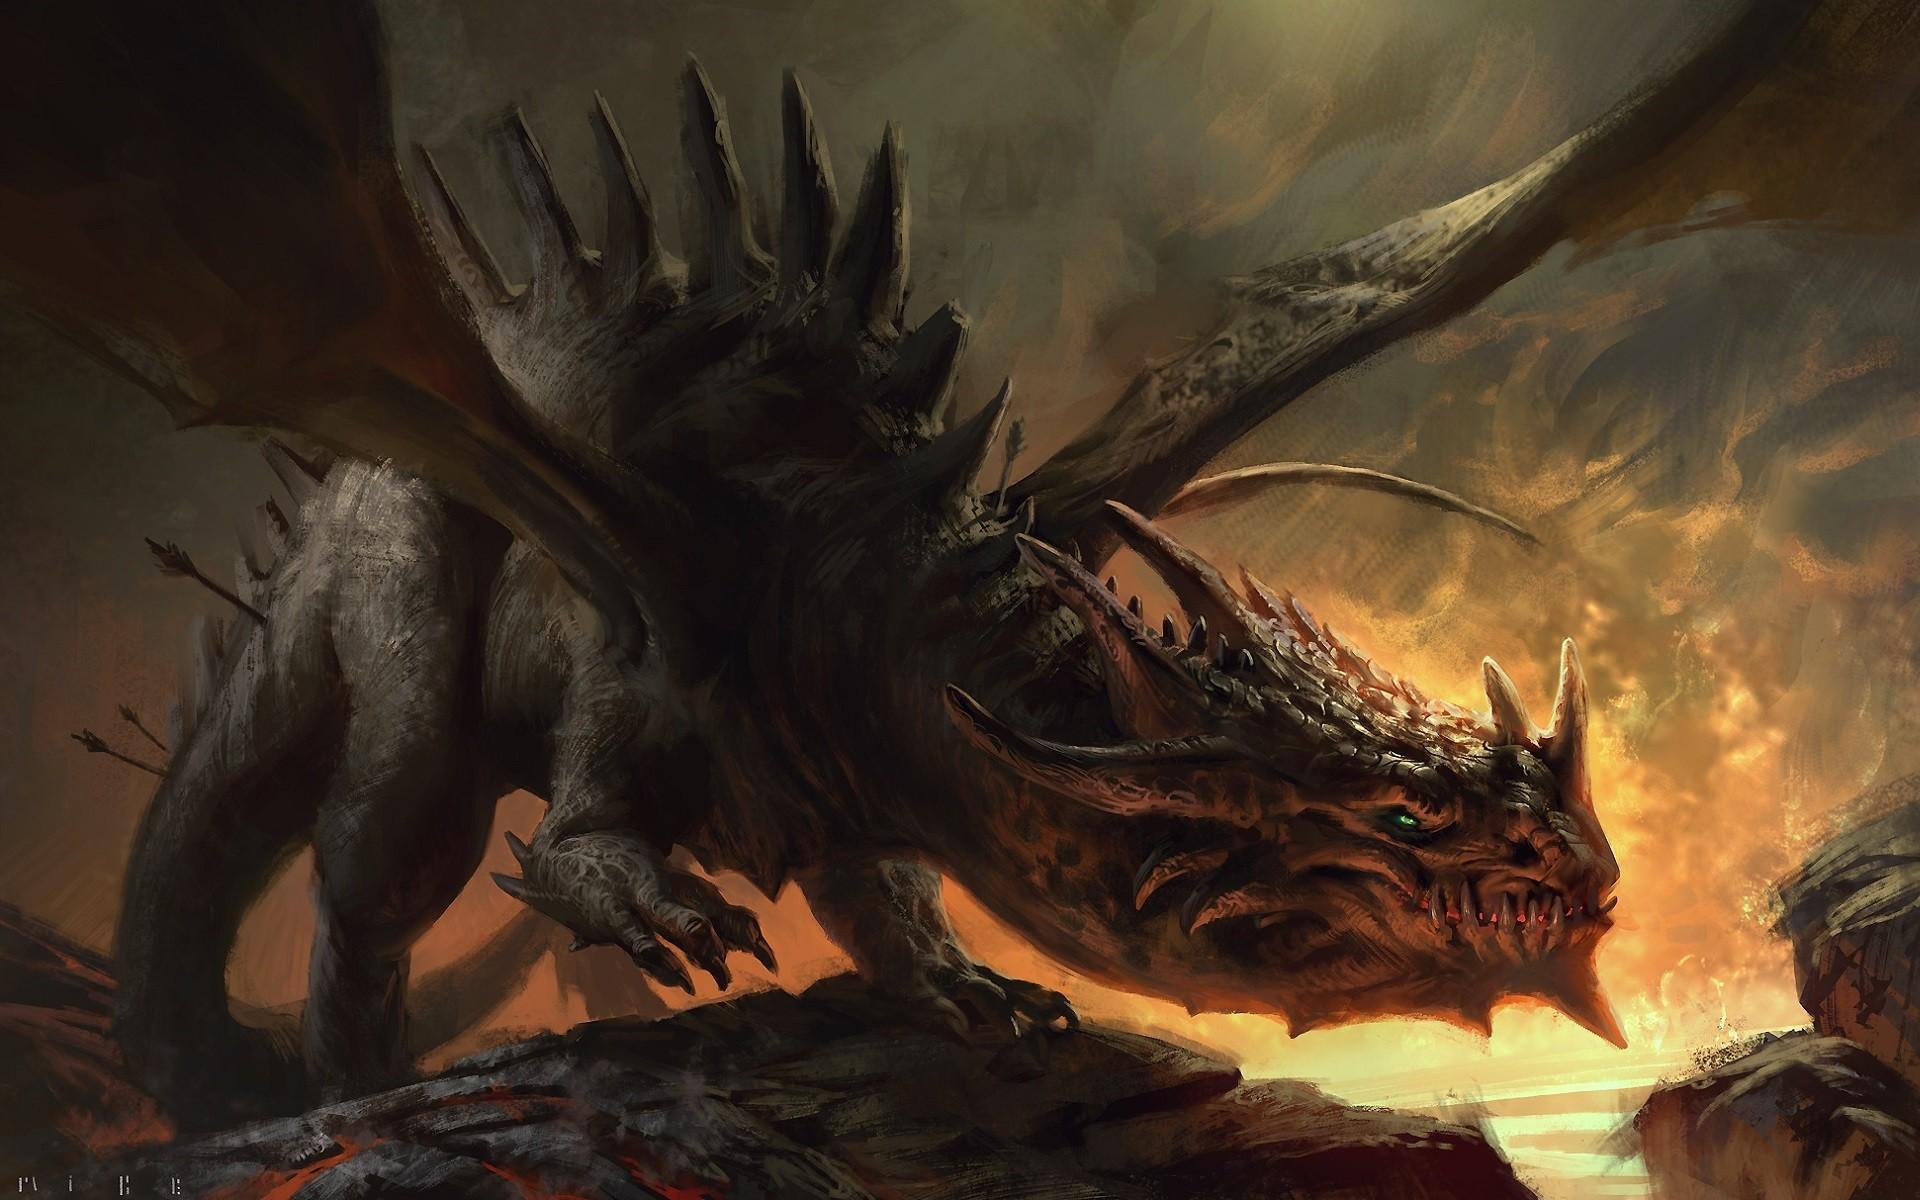 Wallpaper : fantasy art, artwork, dragon, demon, mythology ...